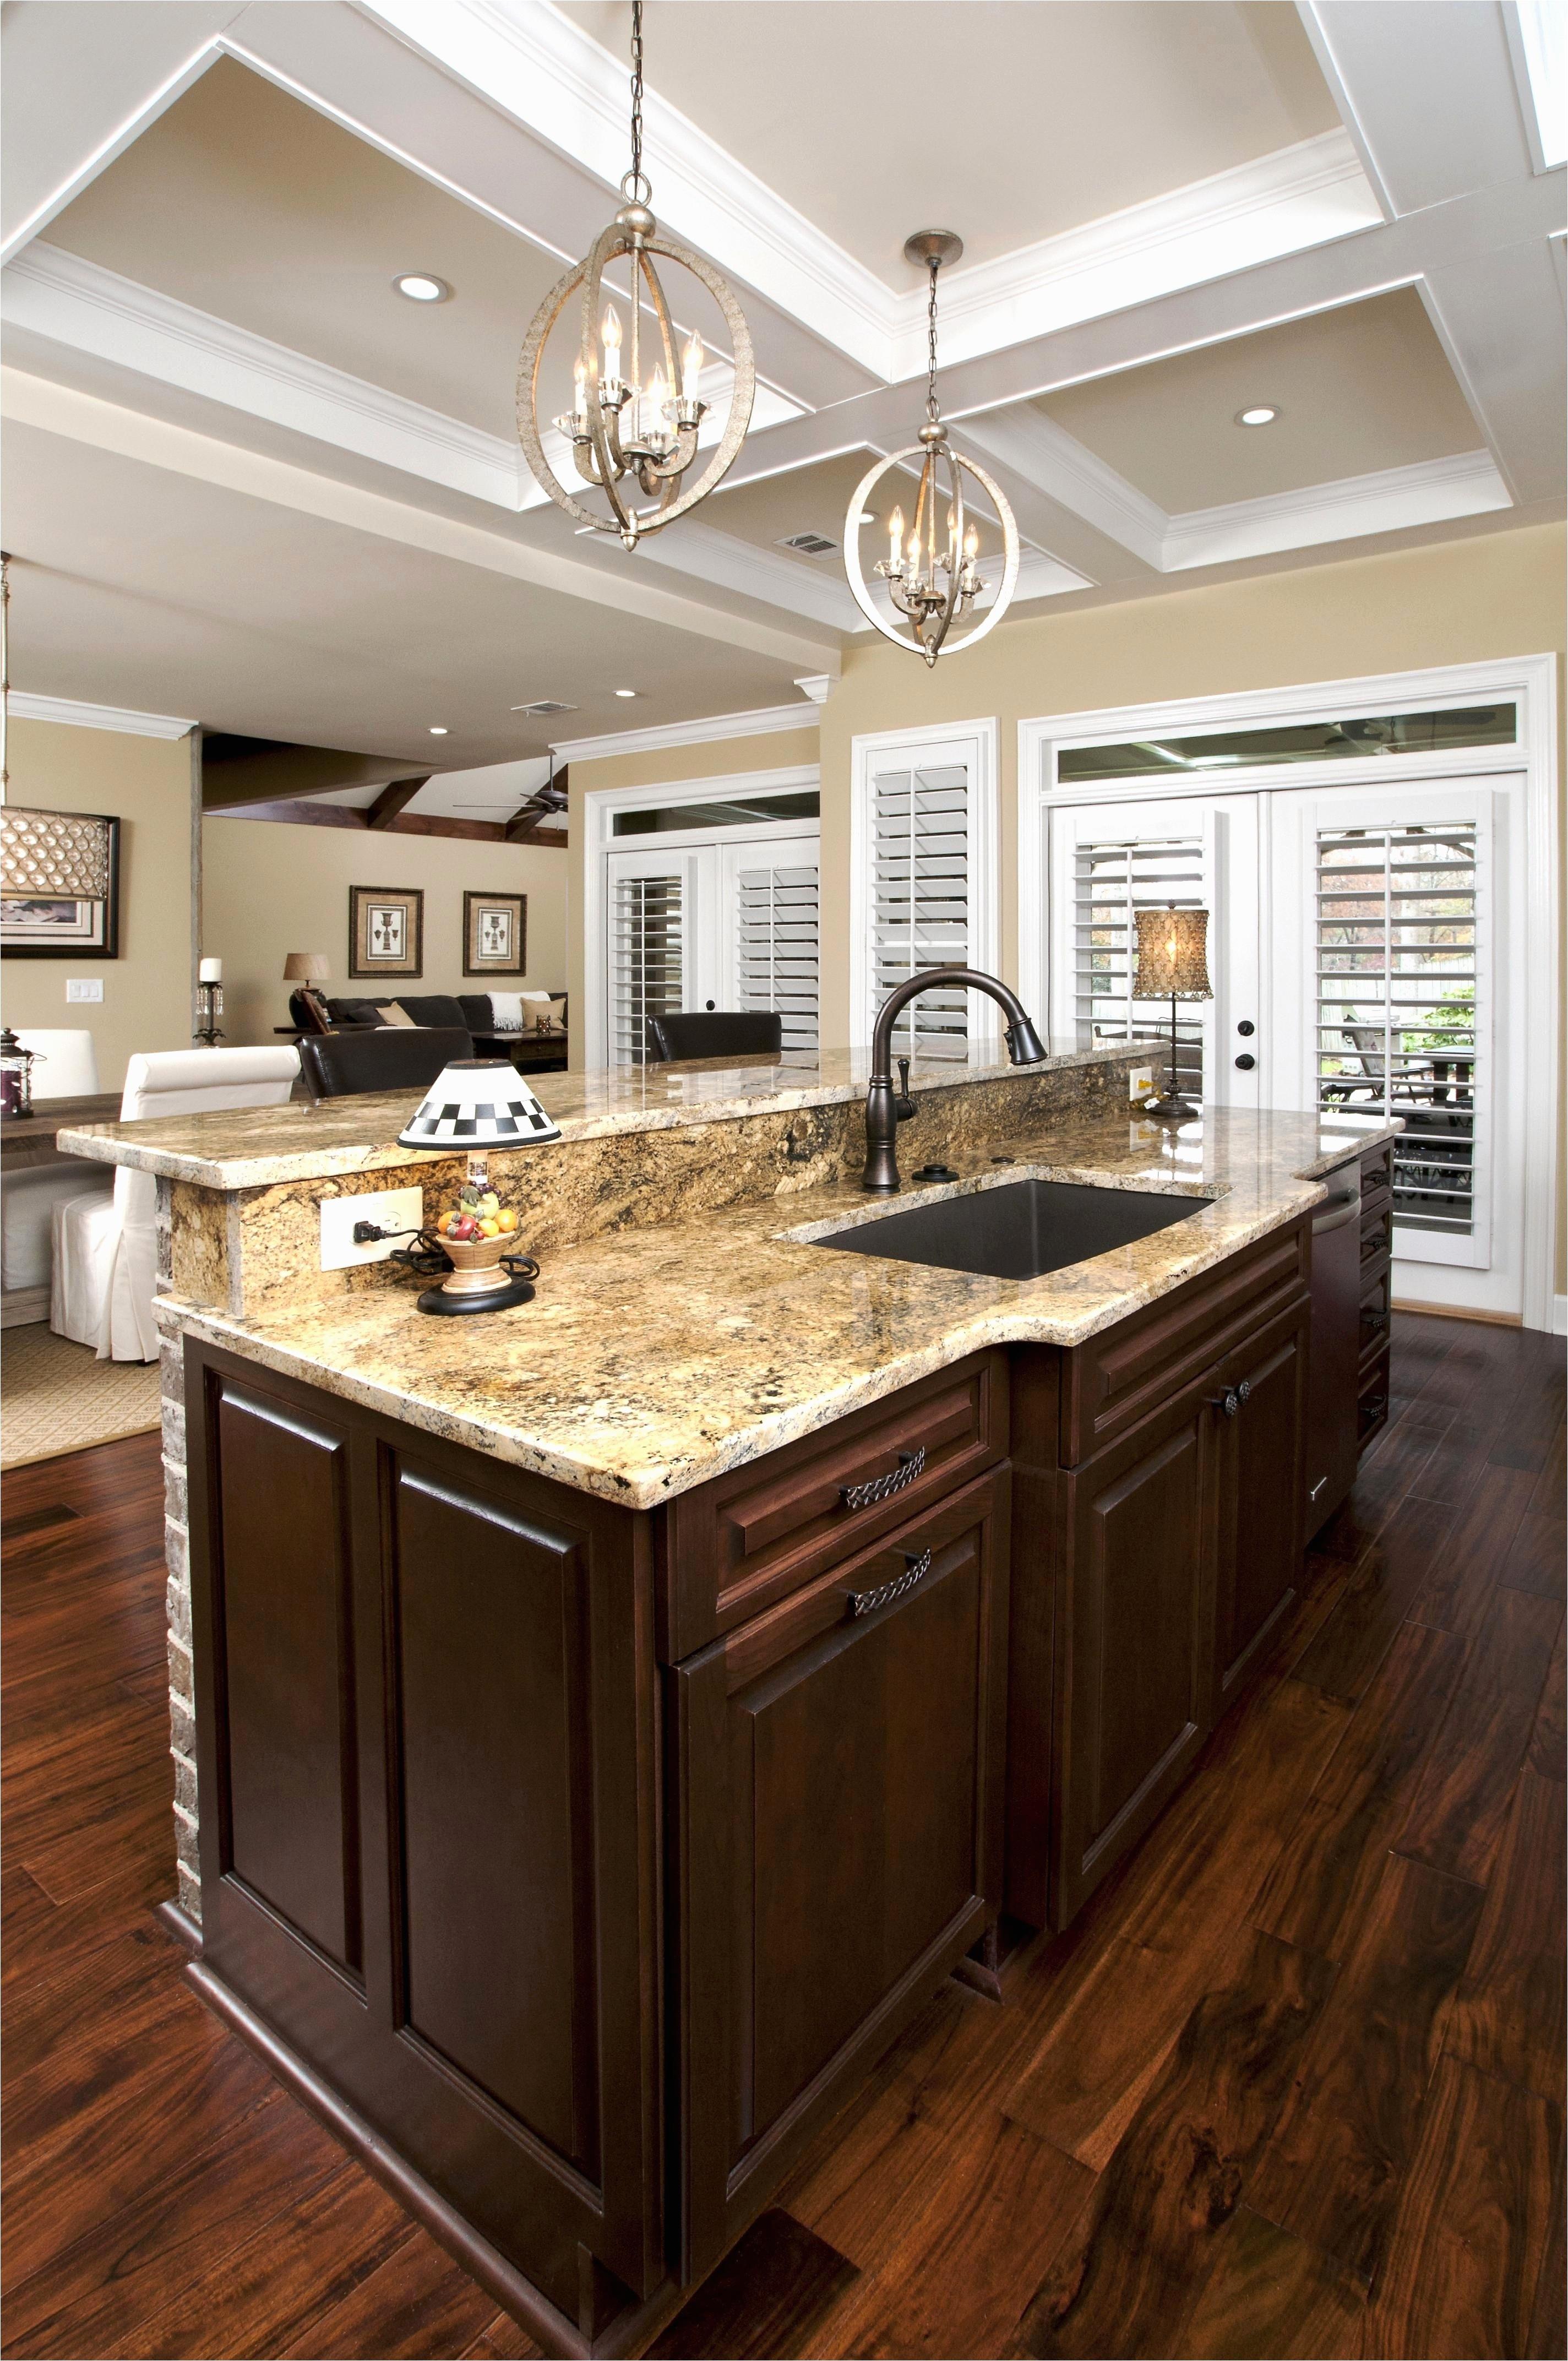 unfinished wood furniture kitchen cabinets designs amazing exclusive kitchen designs alluring kitchen cabinet 0d bright lights